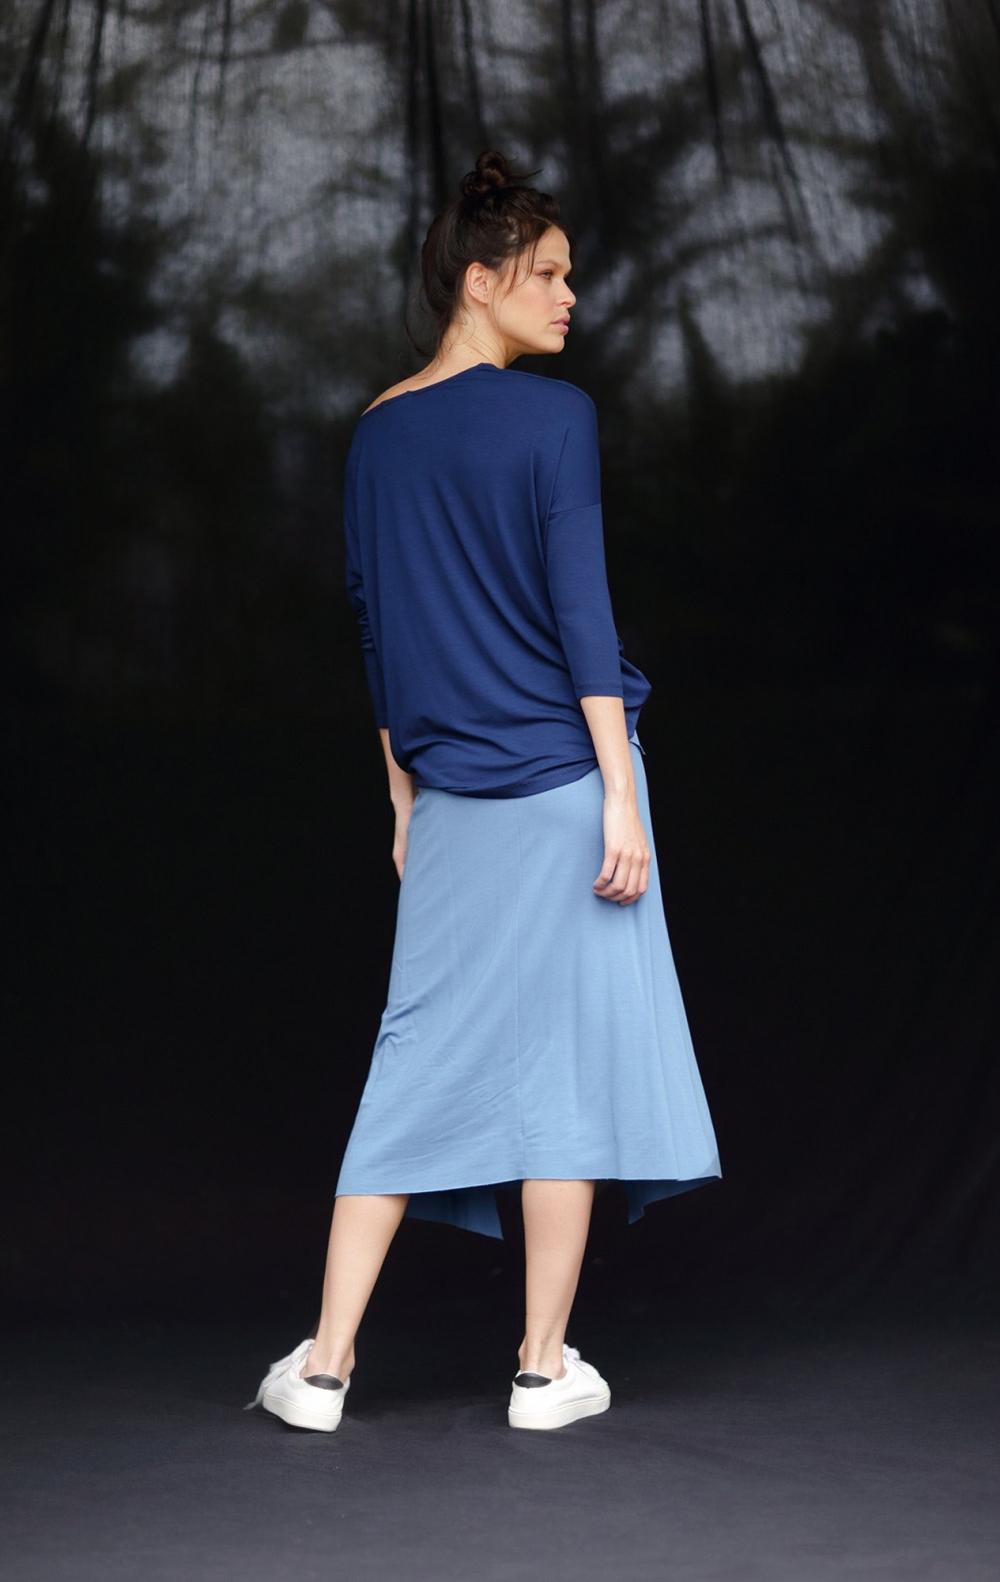 Blusa Malha Sophia Azul  - Foto 2